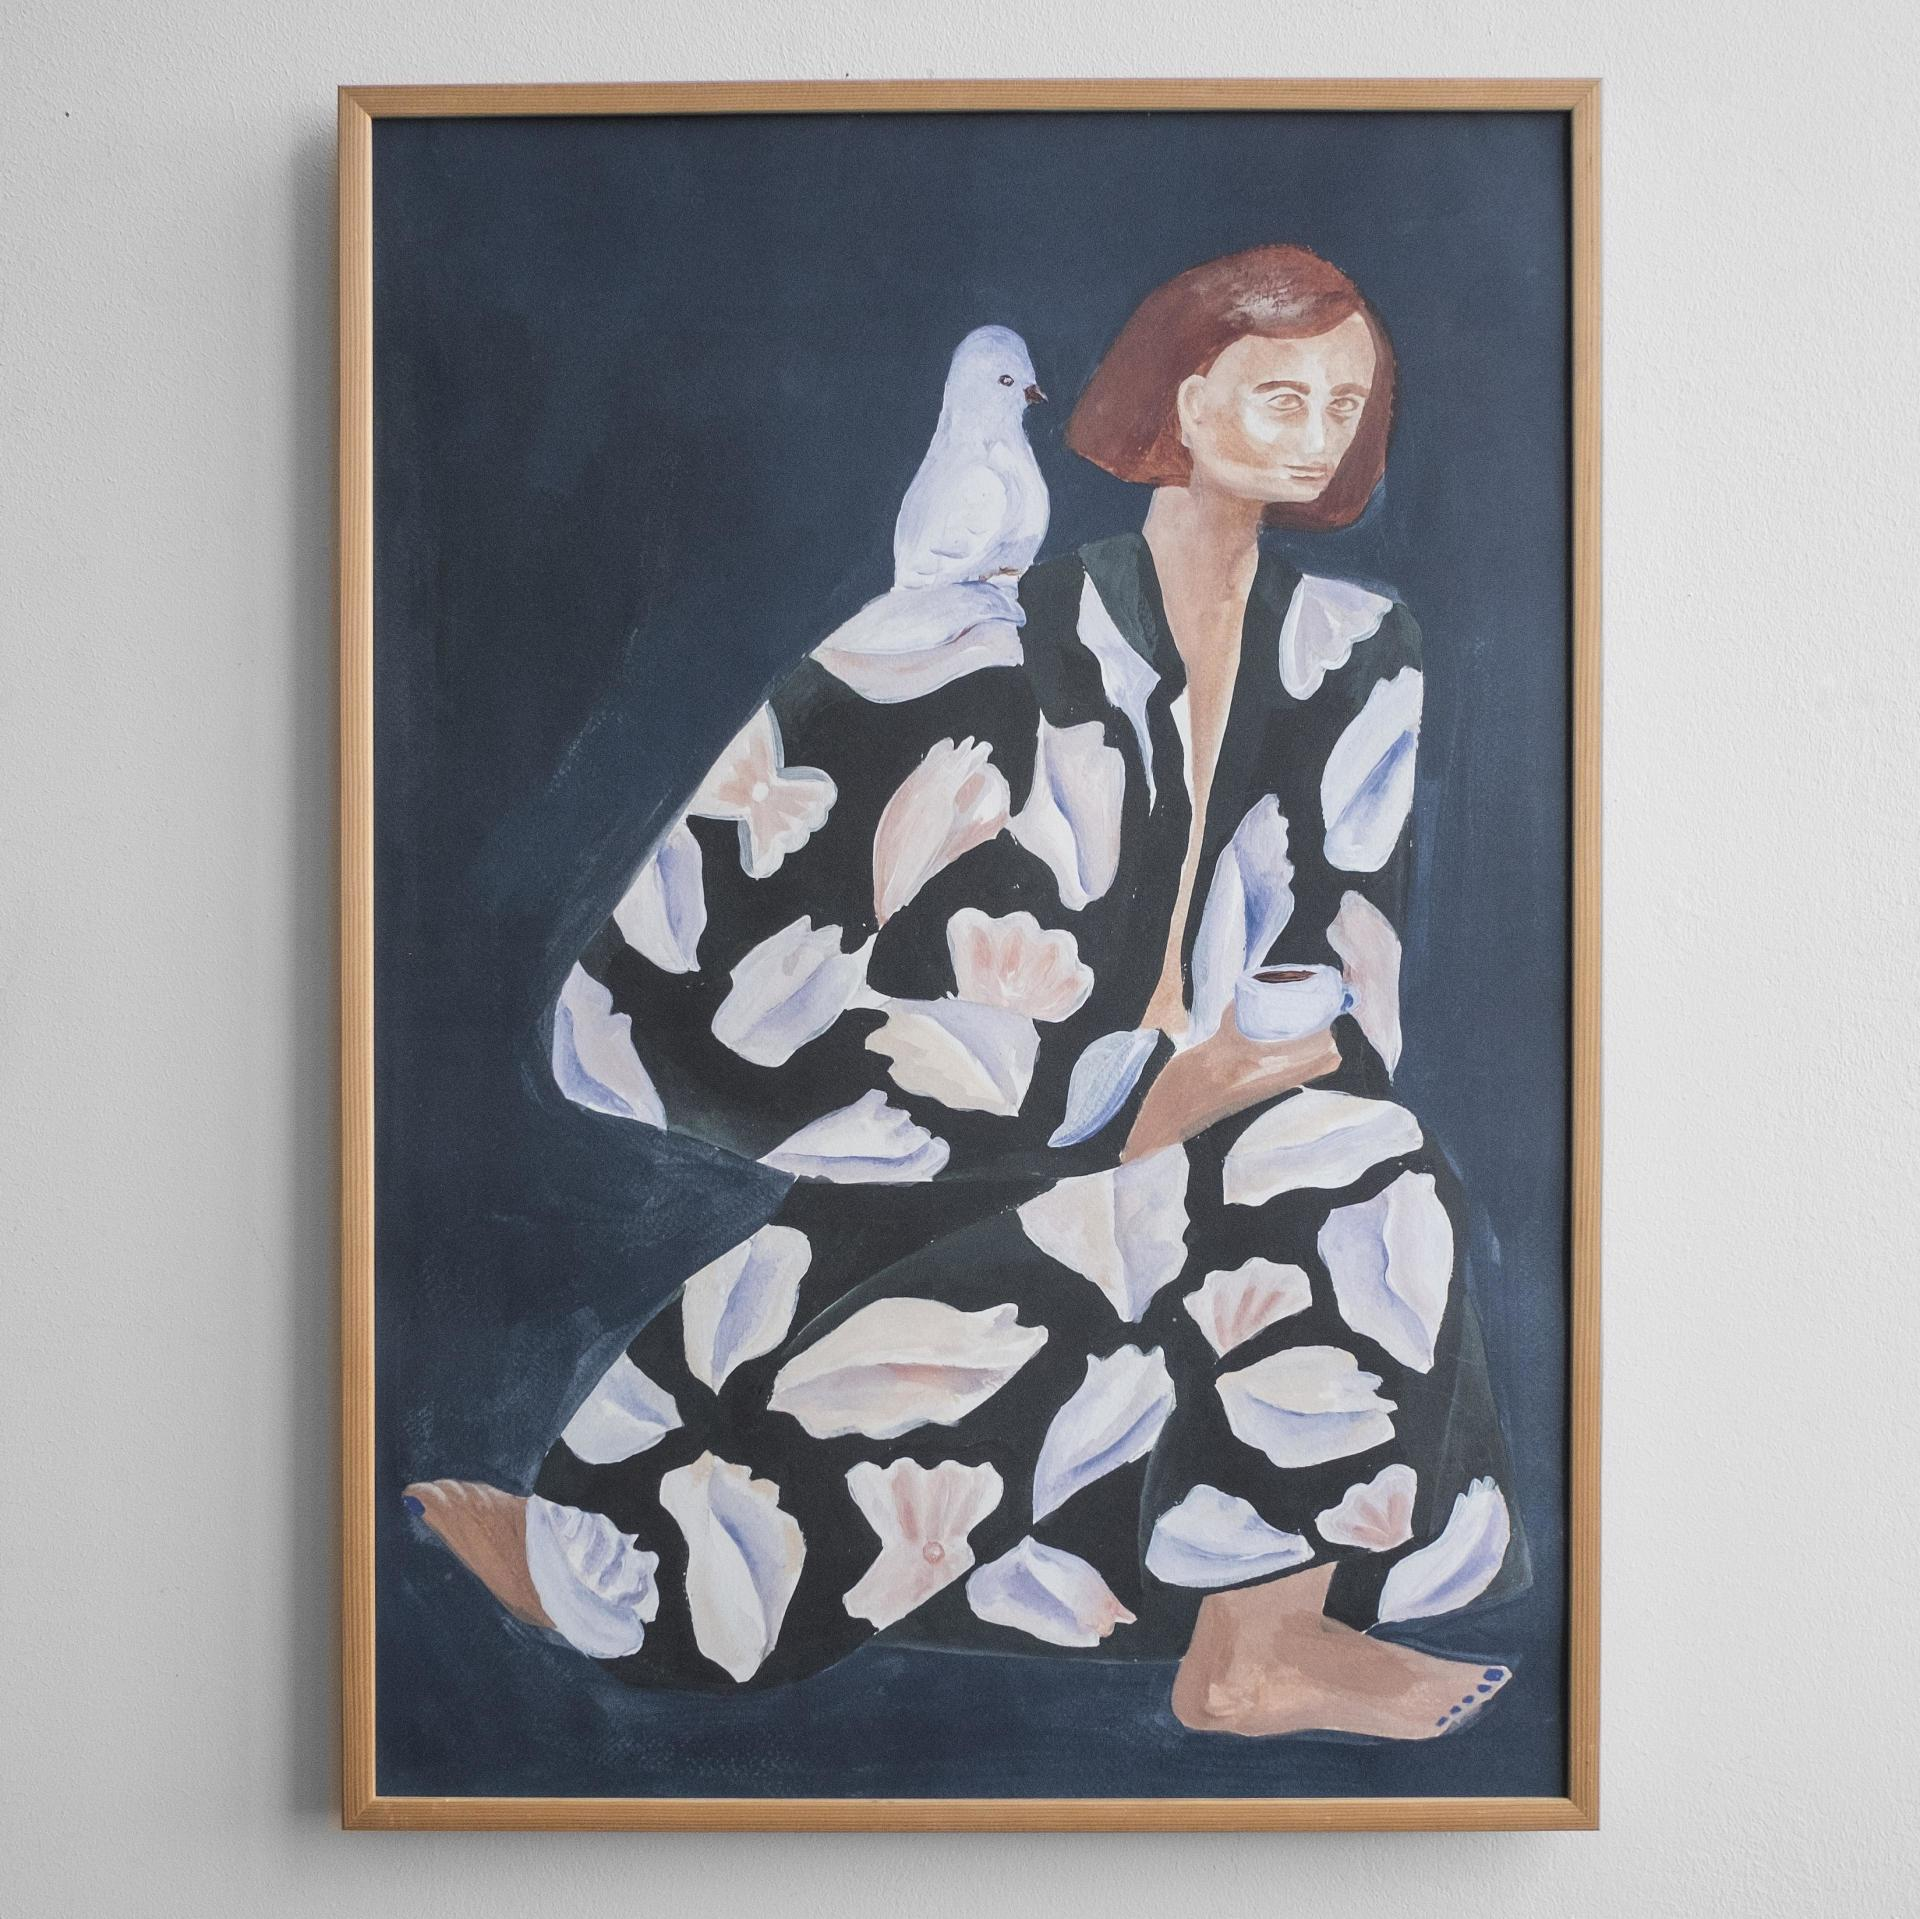 Fine Little Day Autorský plakát Skrud Snäcka by Sofia Lind 50x70 cm, modrá barva, papír